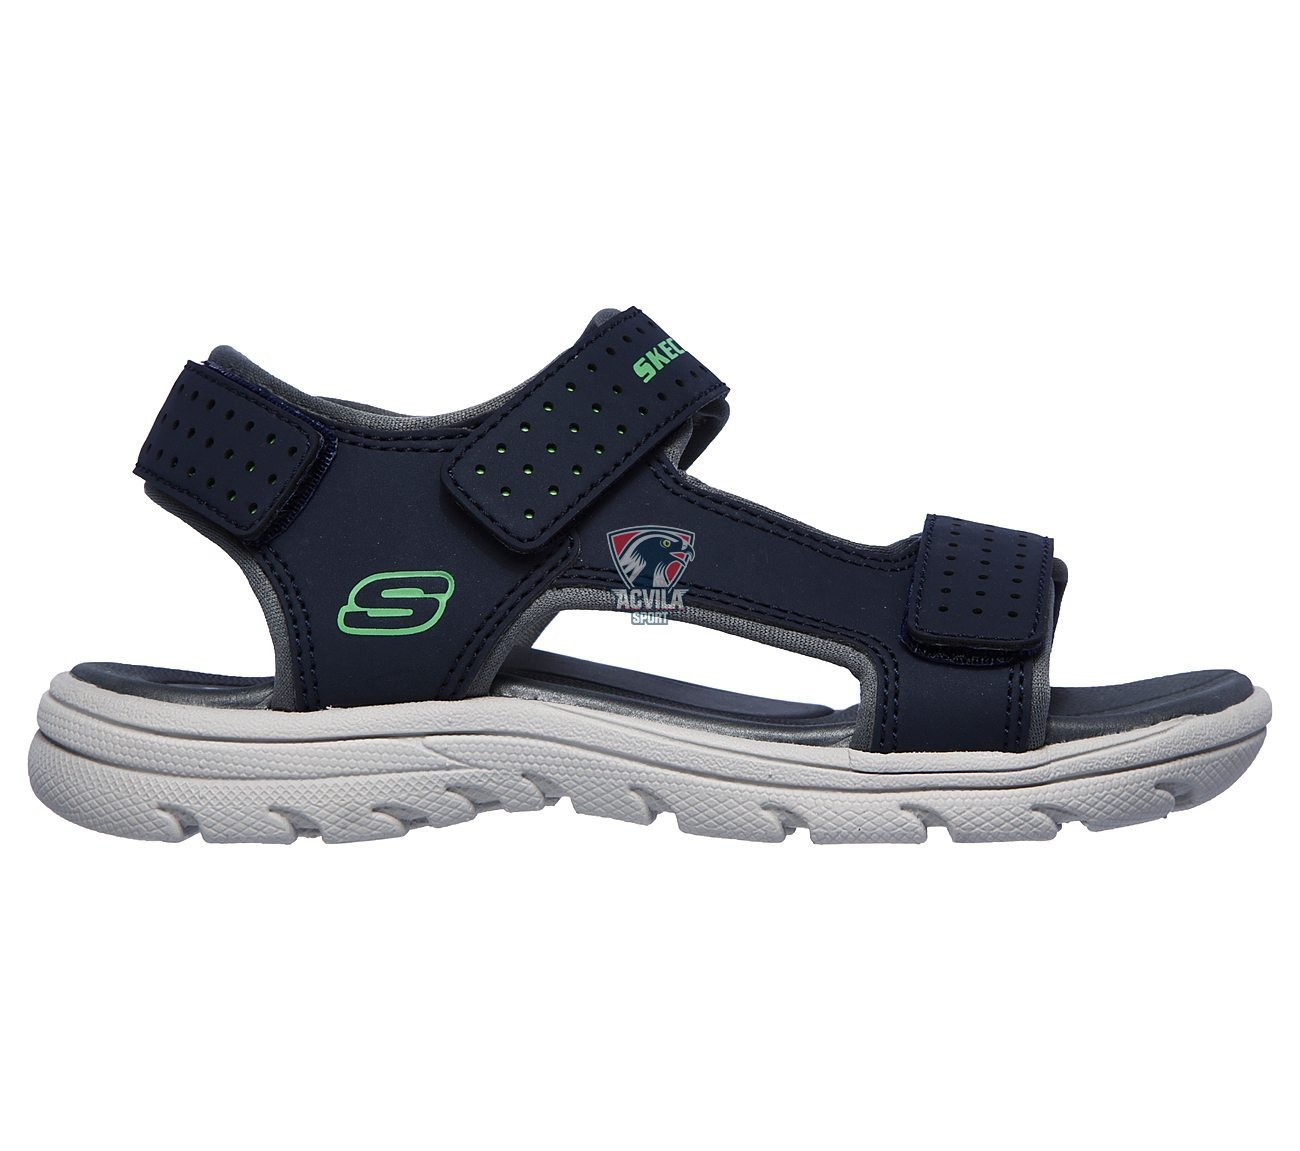 photo 2 Детская обувь SKECHERS SUPREME - RIVER BLAST